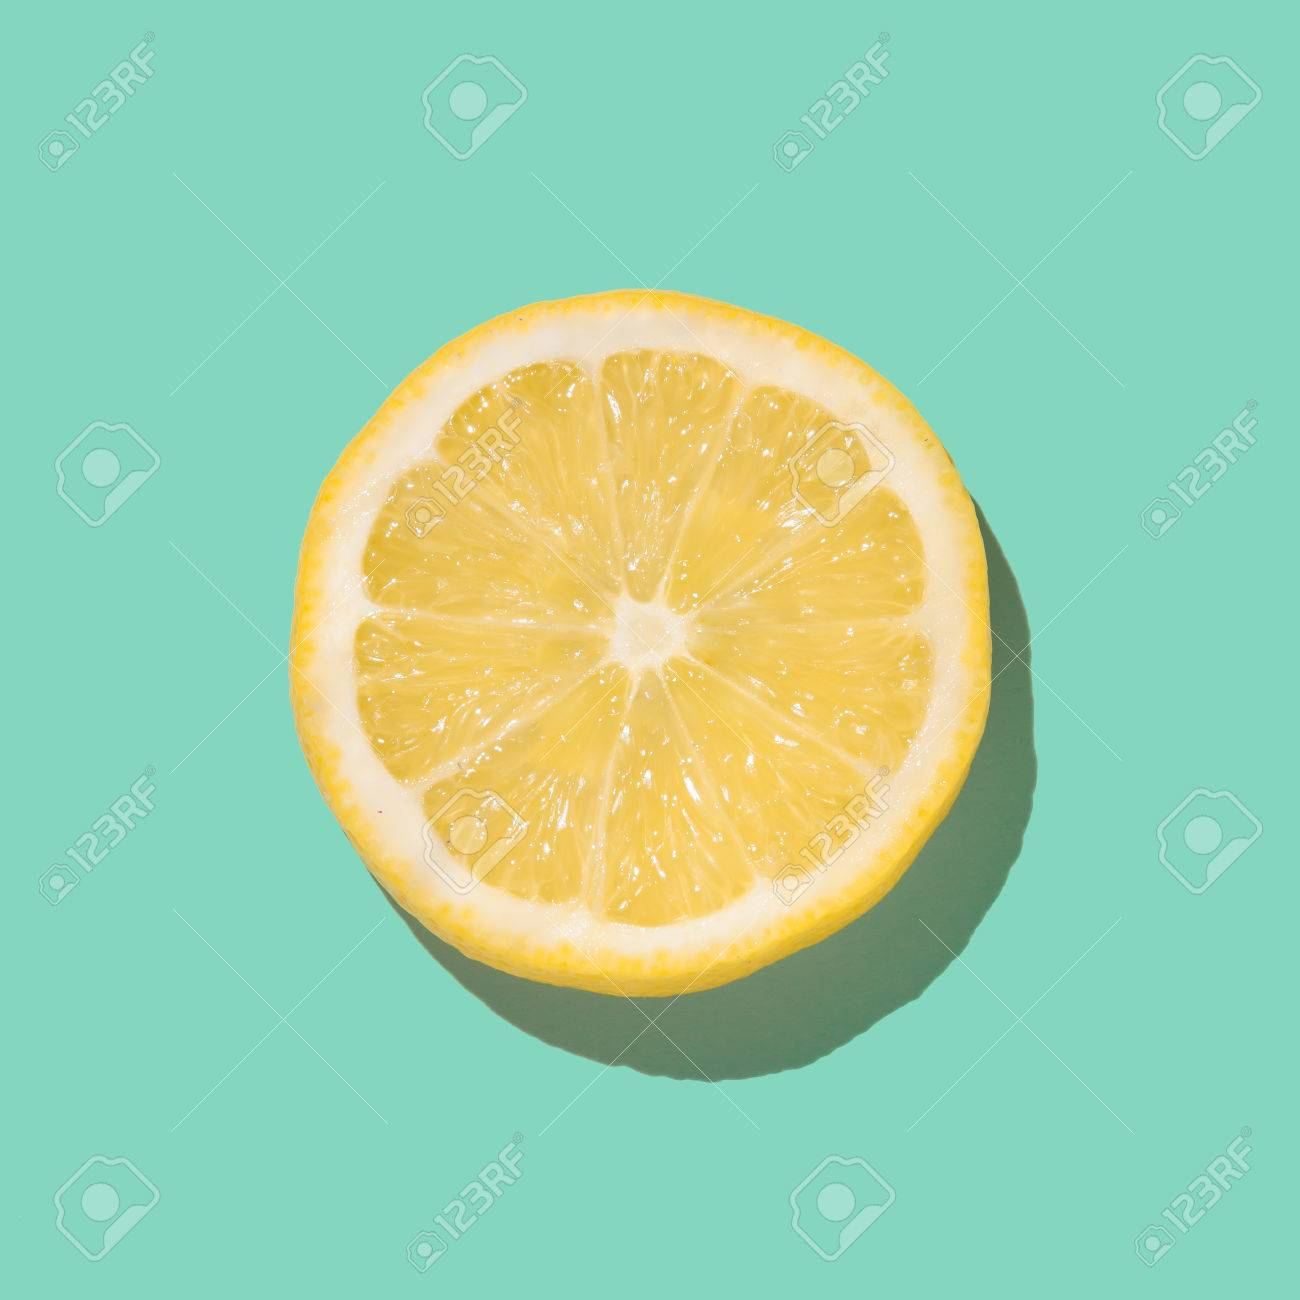 Fresh lemon slice close up on bright blue background. Flat lay. Summer concept. - 82877718